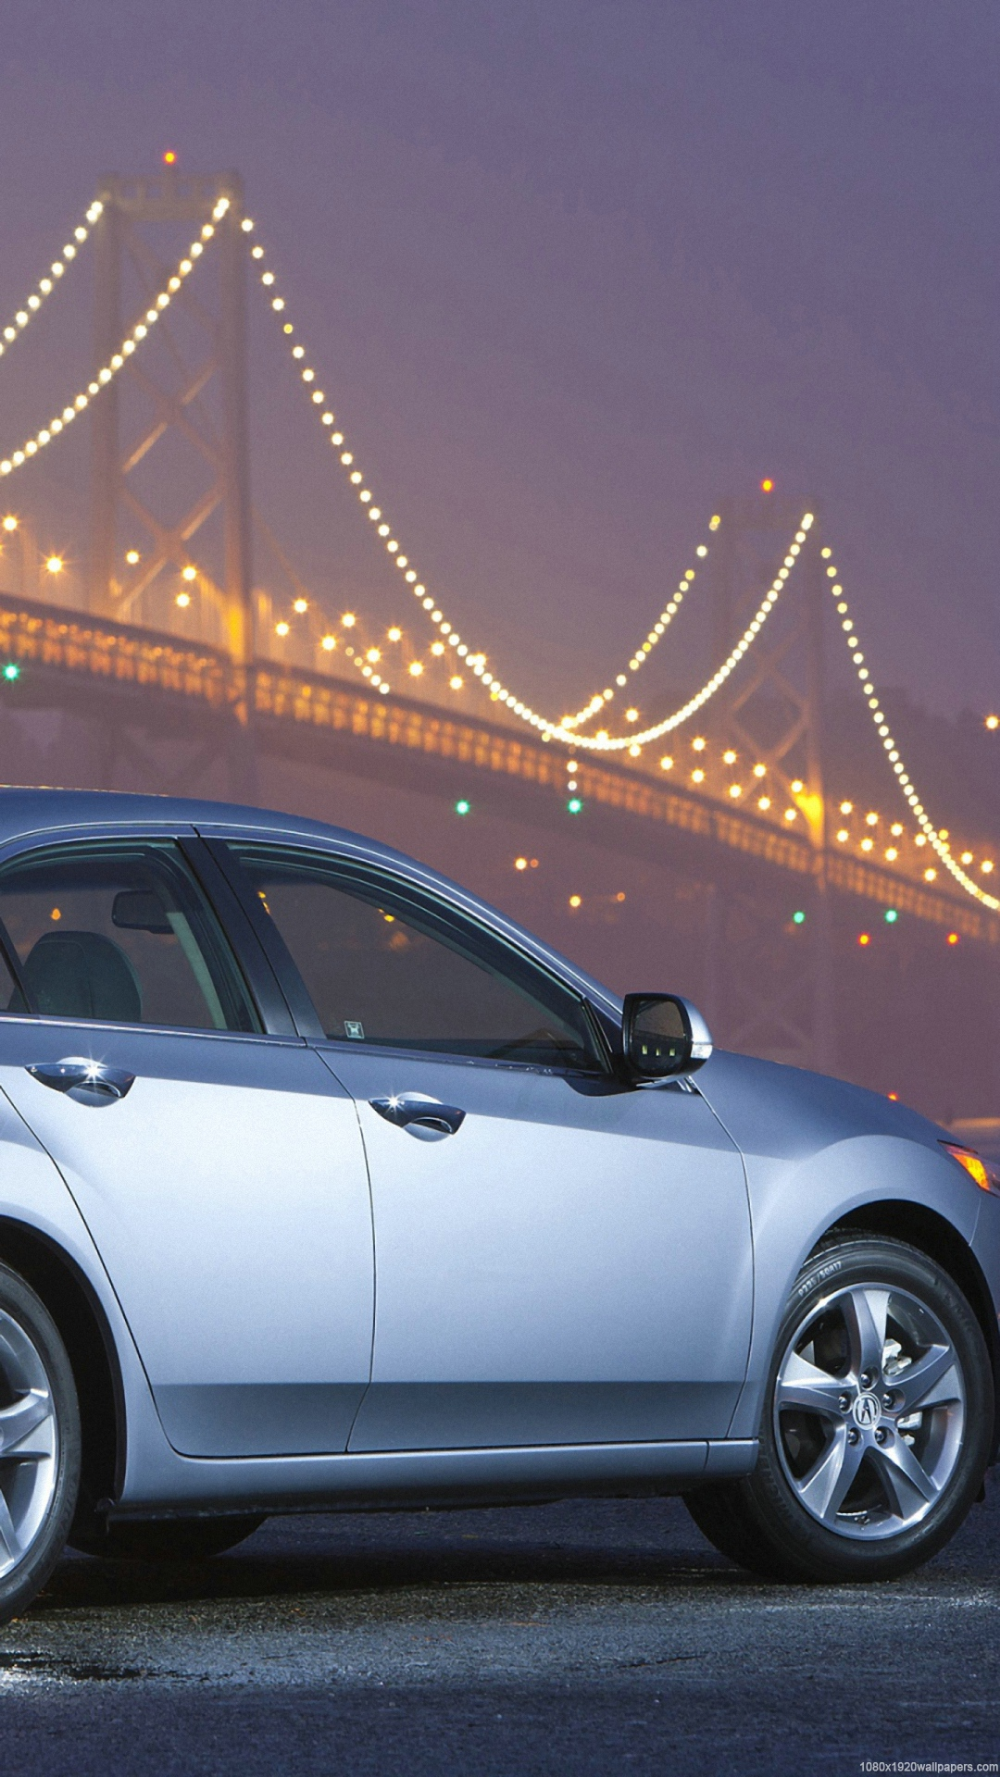 1080x1920 Blue Car Acura Metal Bridge View Fonds D Ecran Hd View Wallpaper Blue Car Acura Car